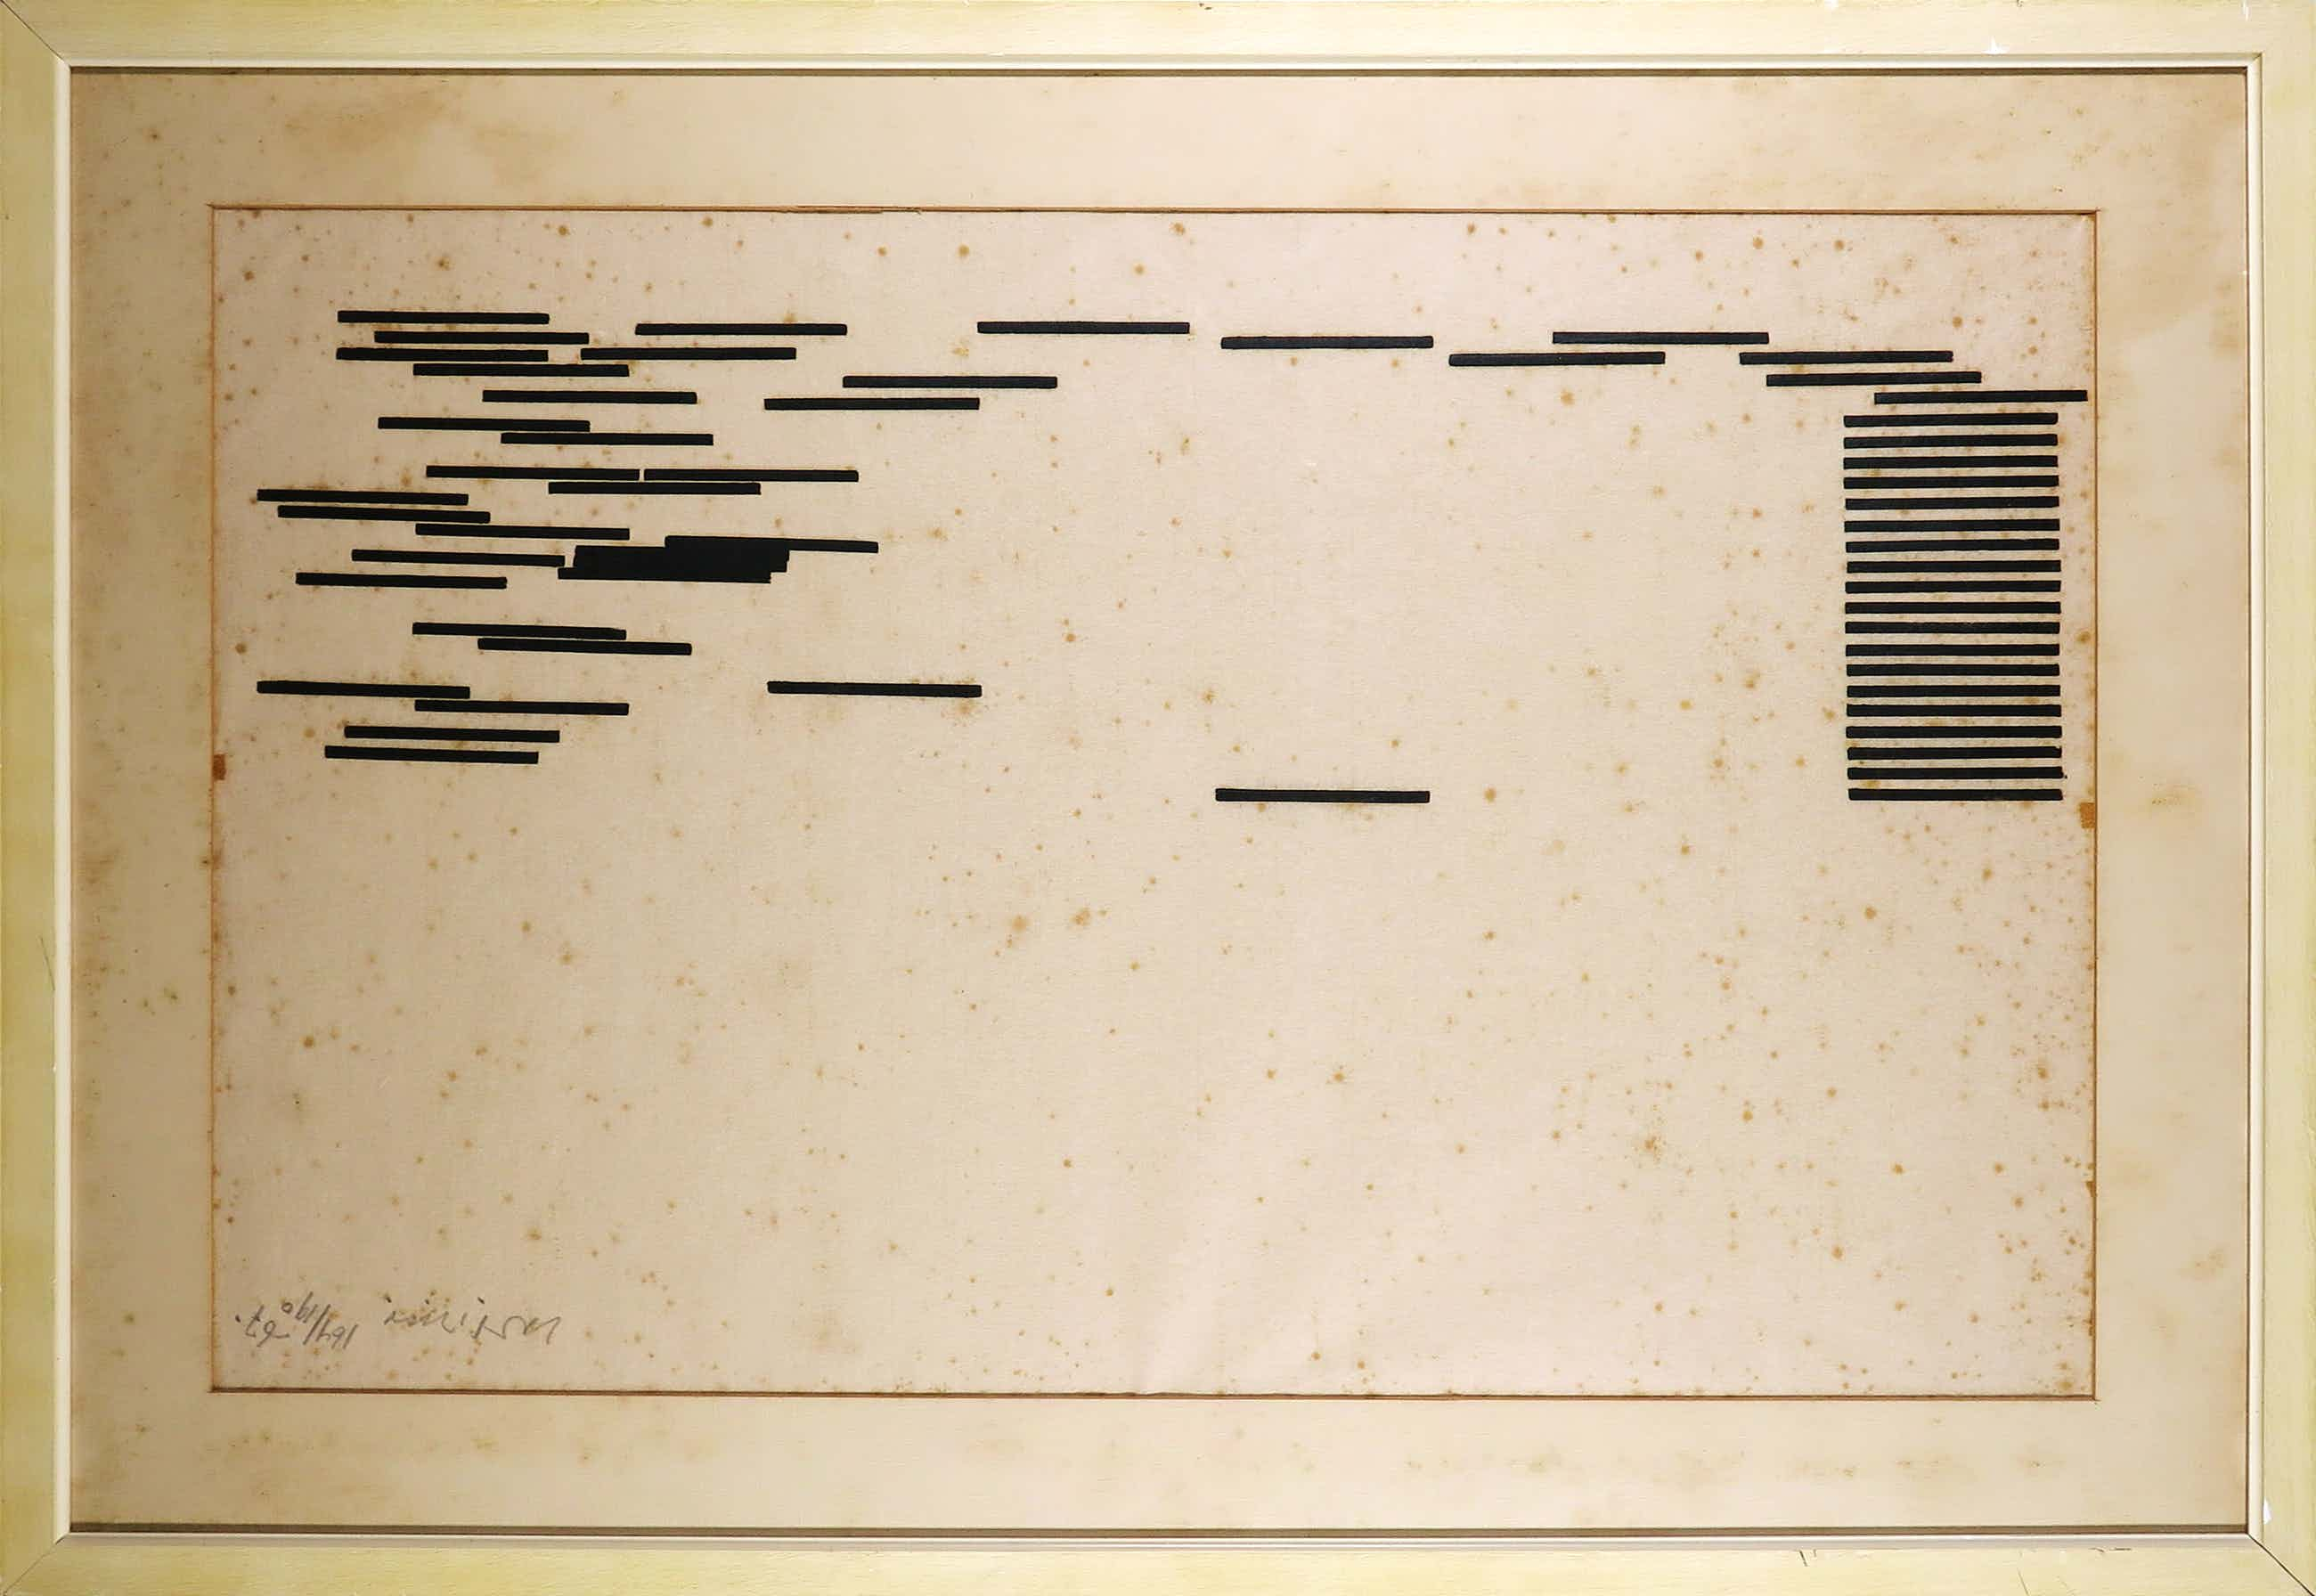 Carel Visser - Houtsnede op Japans papier, Geometrisch abstract - Ingelijst kopen? Bied vanaf 80!